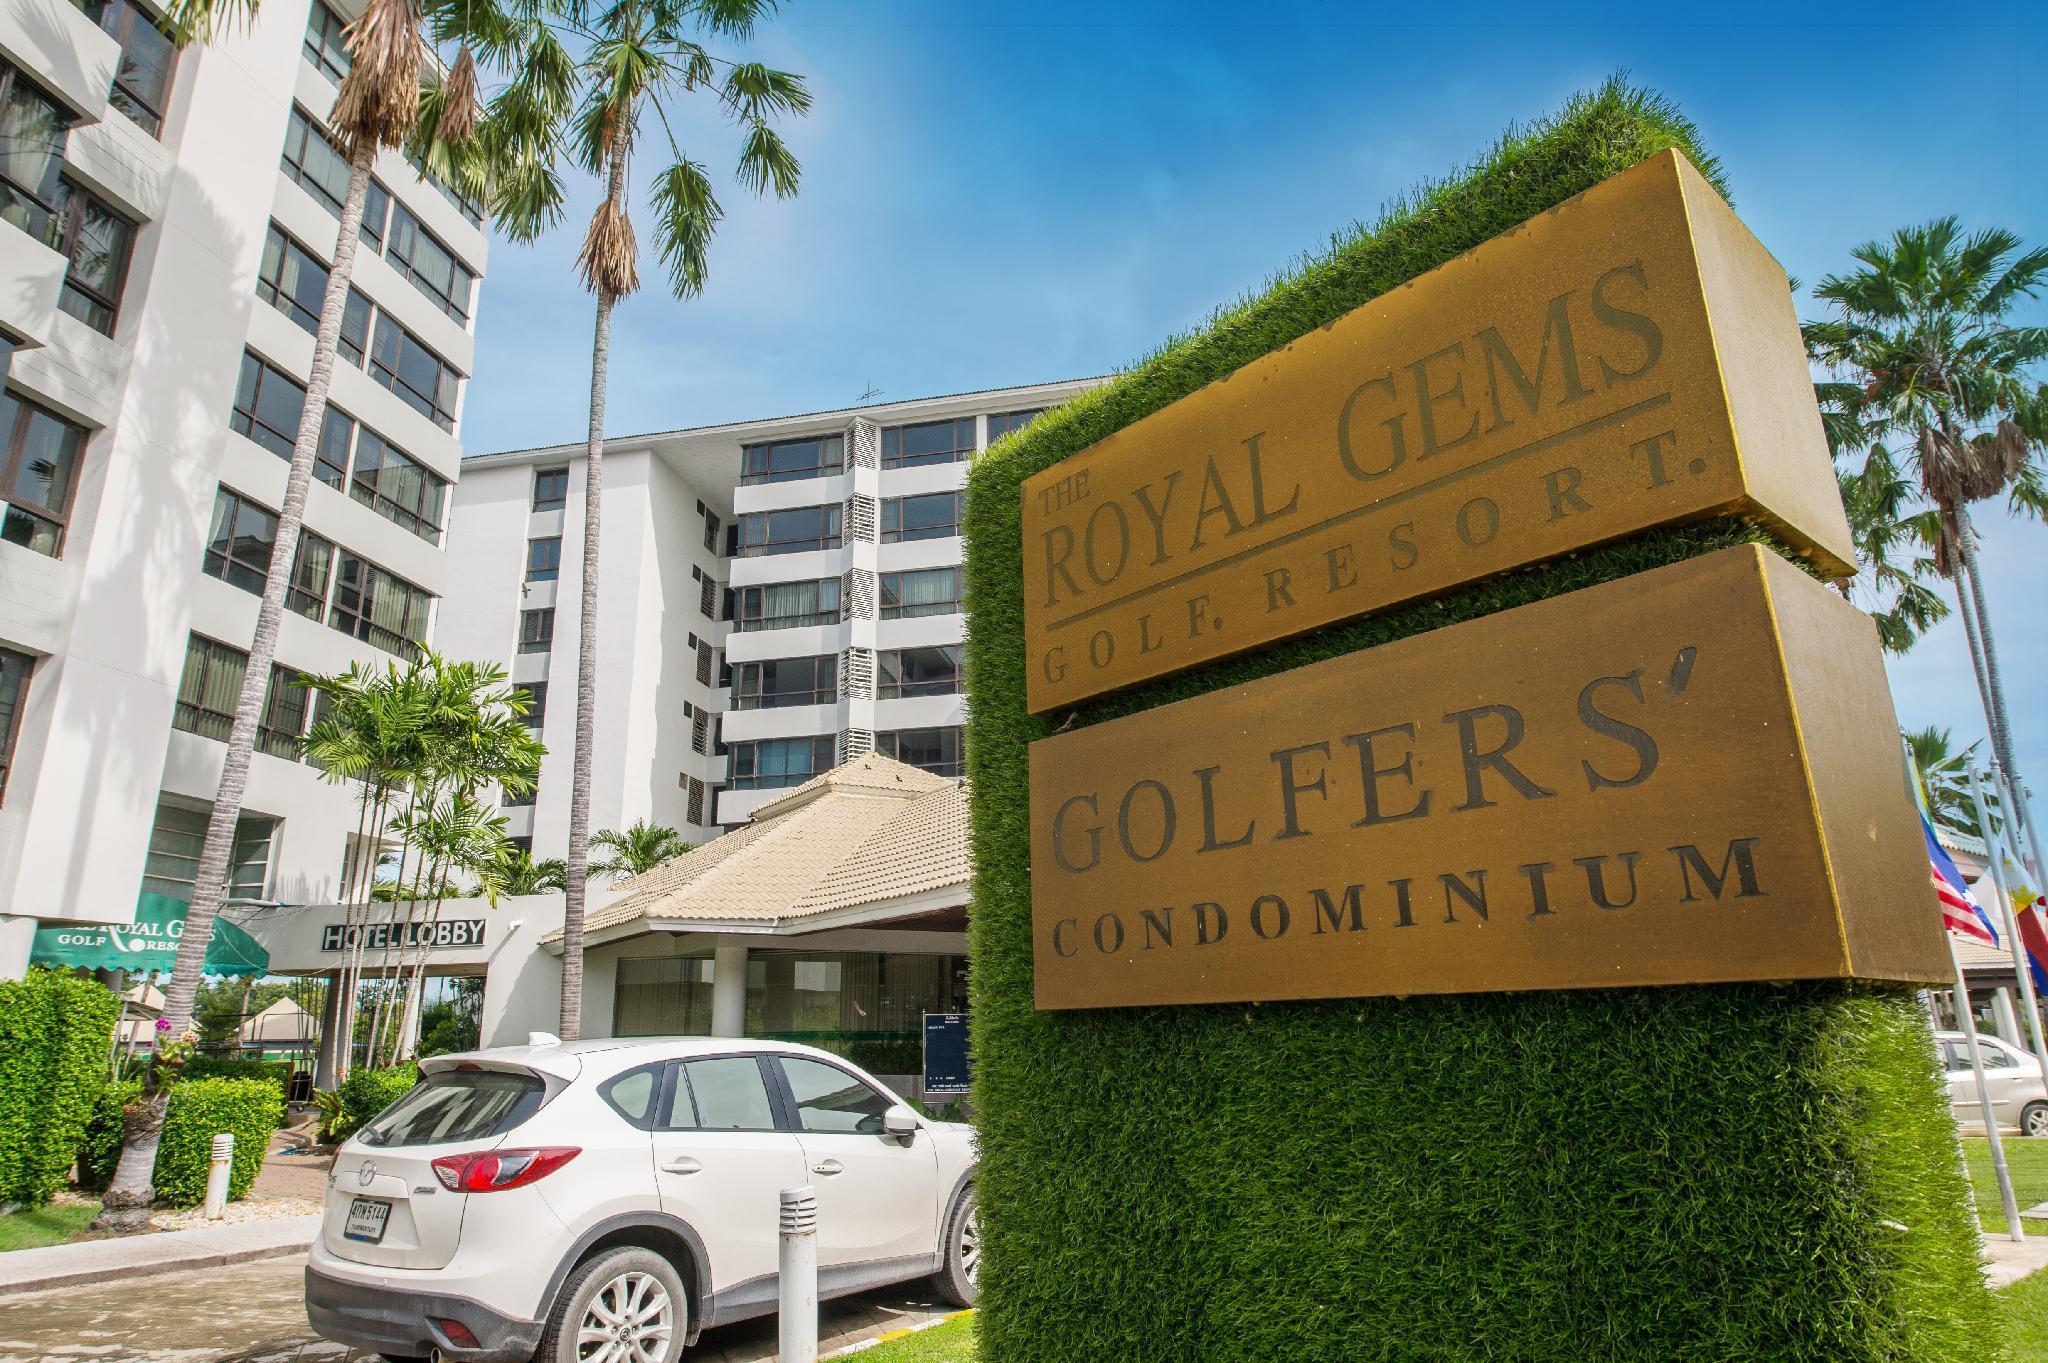 The Royal Gems Golf Resort